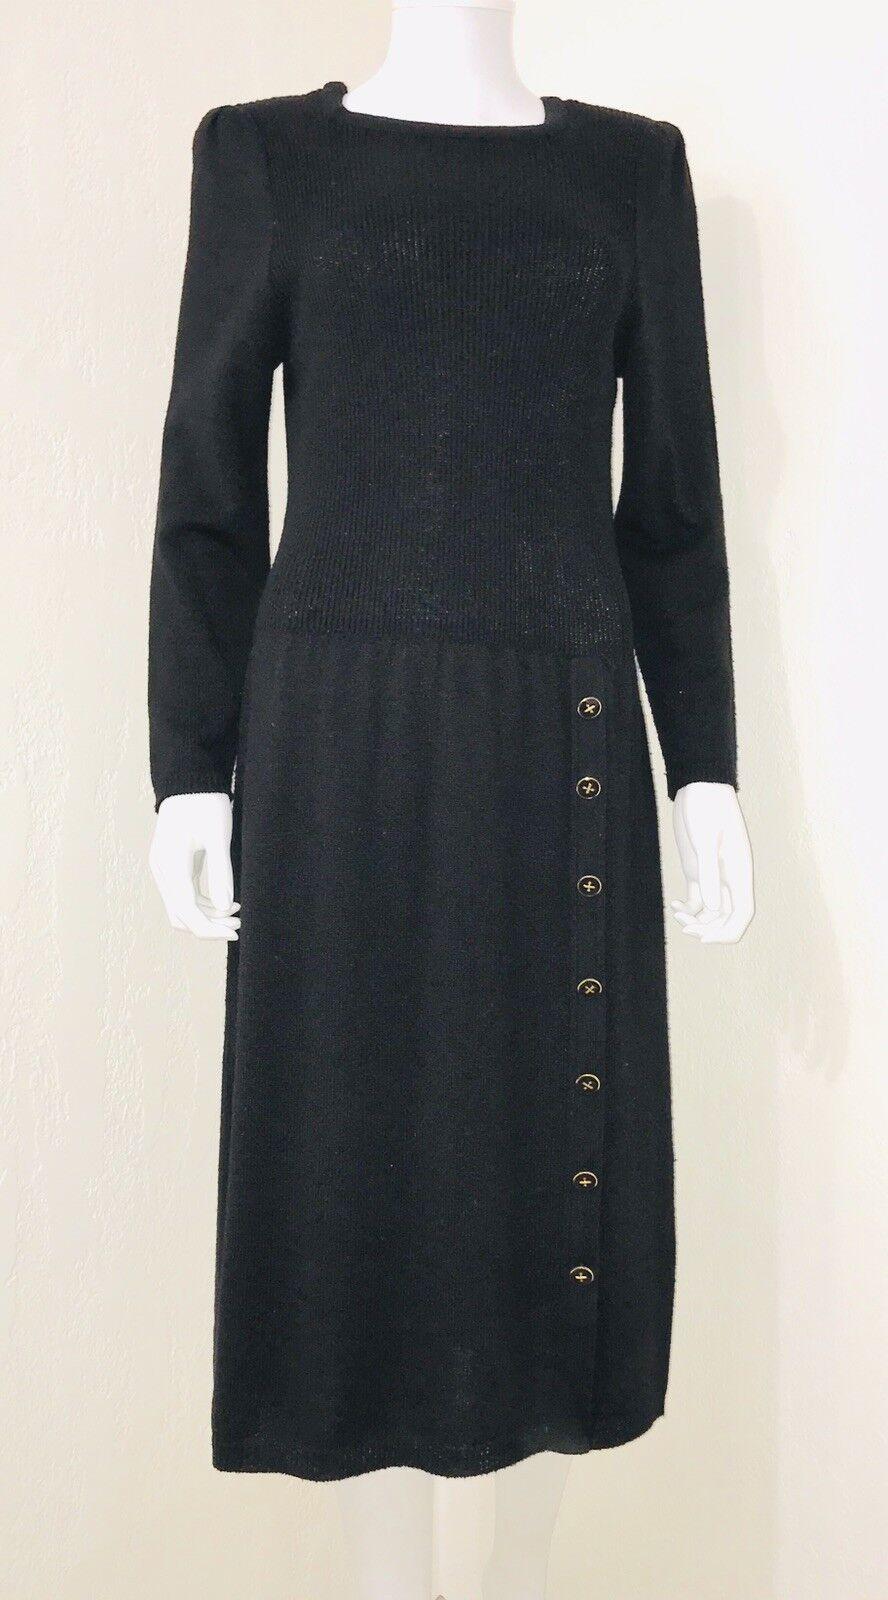 Vintage Tricots schwarz Ribbed Cap Sleeve Drop Waist Sweater Dress Größe 12 EUC